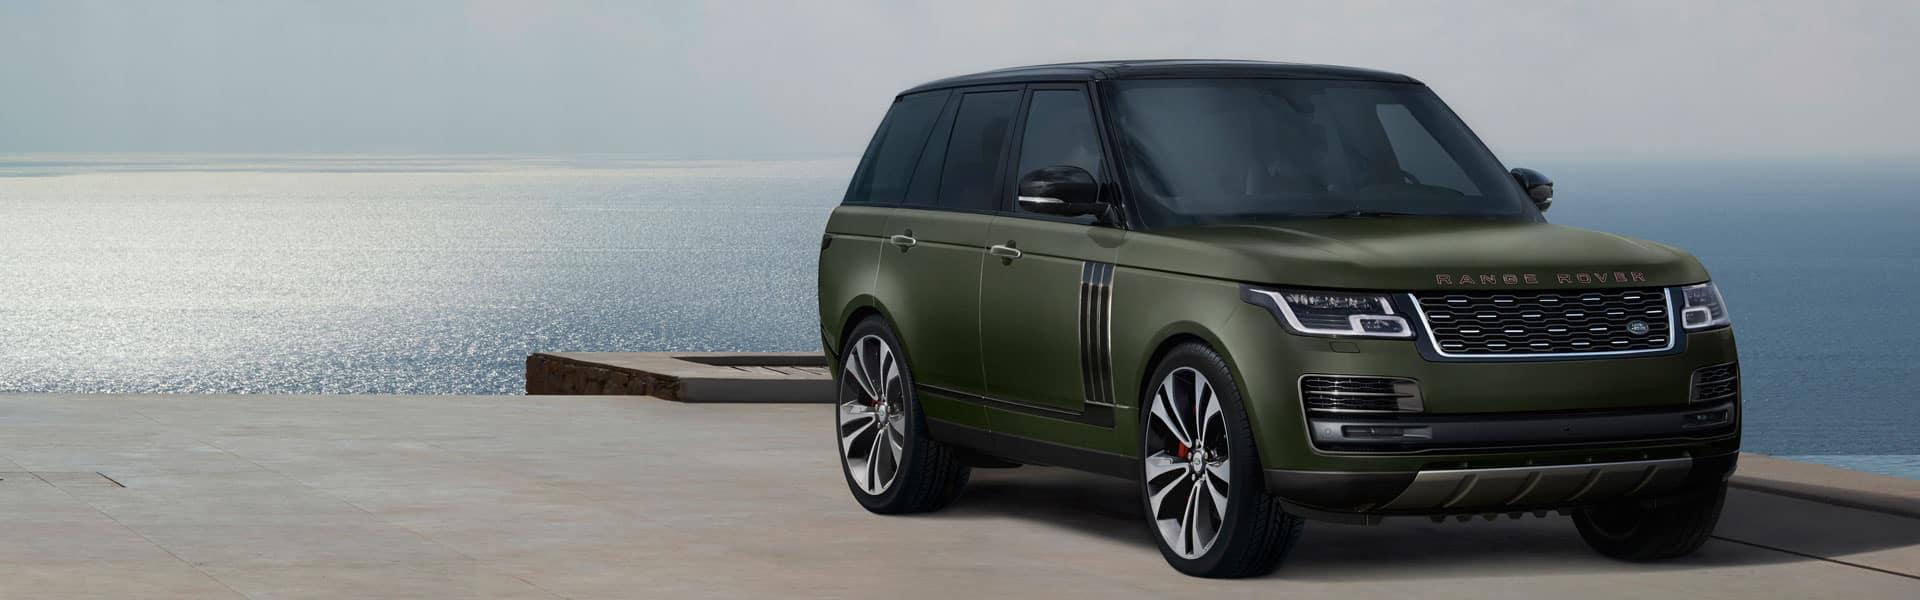 2022 Range Rover in Oklahoma City